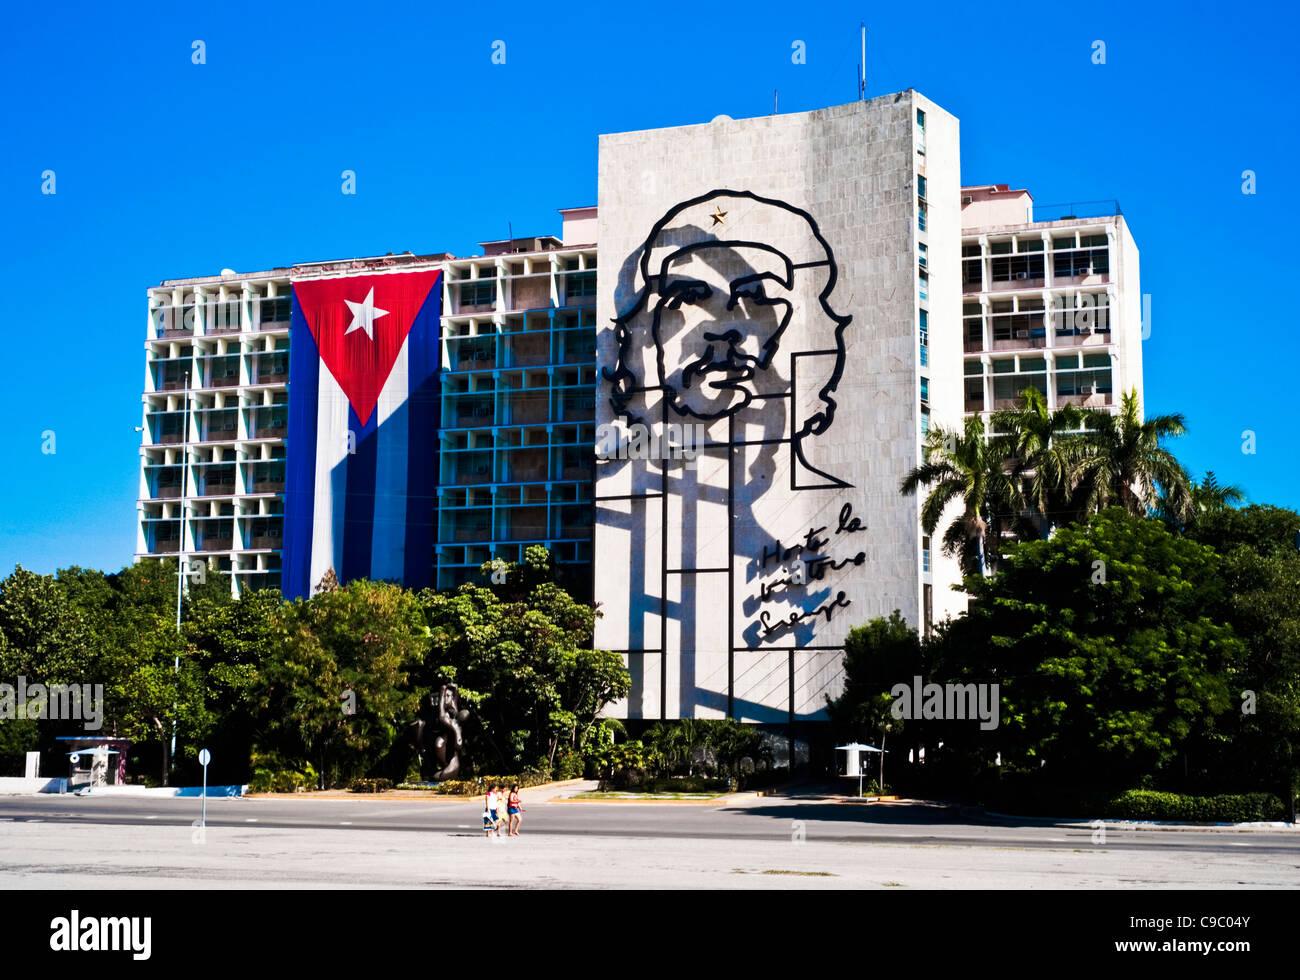 Kuba, Karibik, Havanna, Che Guevara Eisen Kunstwerk auf das Innenministerium auf revolutionäre Platz. Stockbild